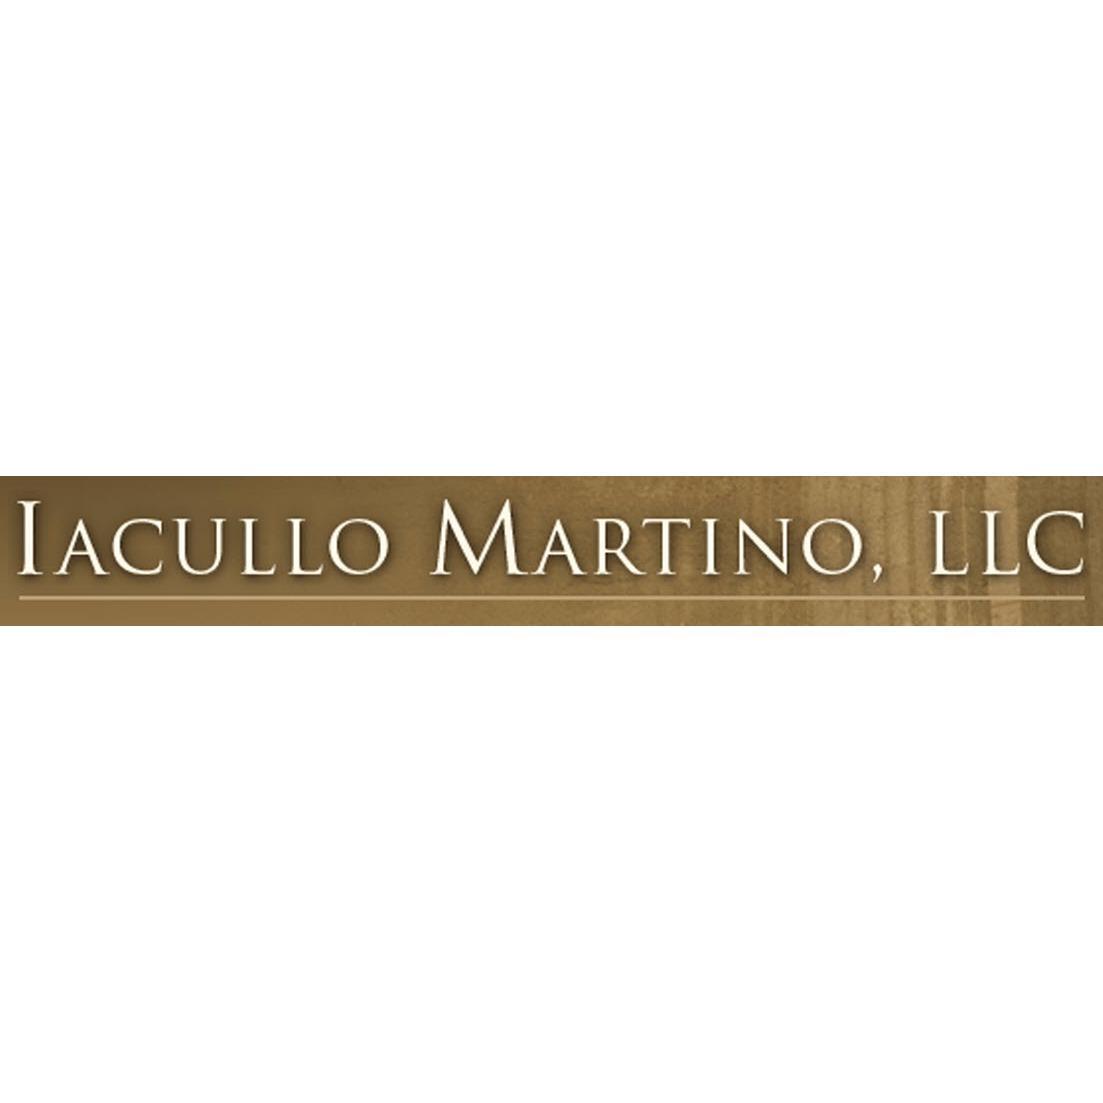 Iacullo Martino, LLC